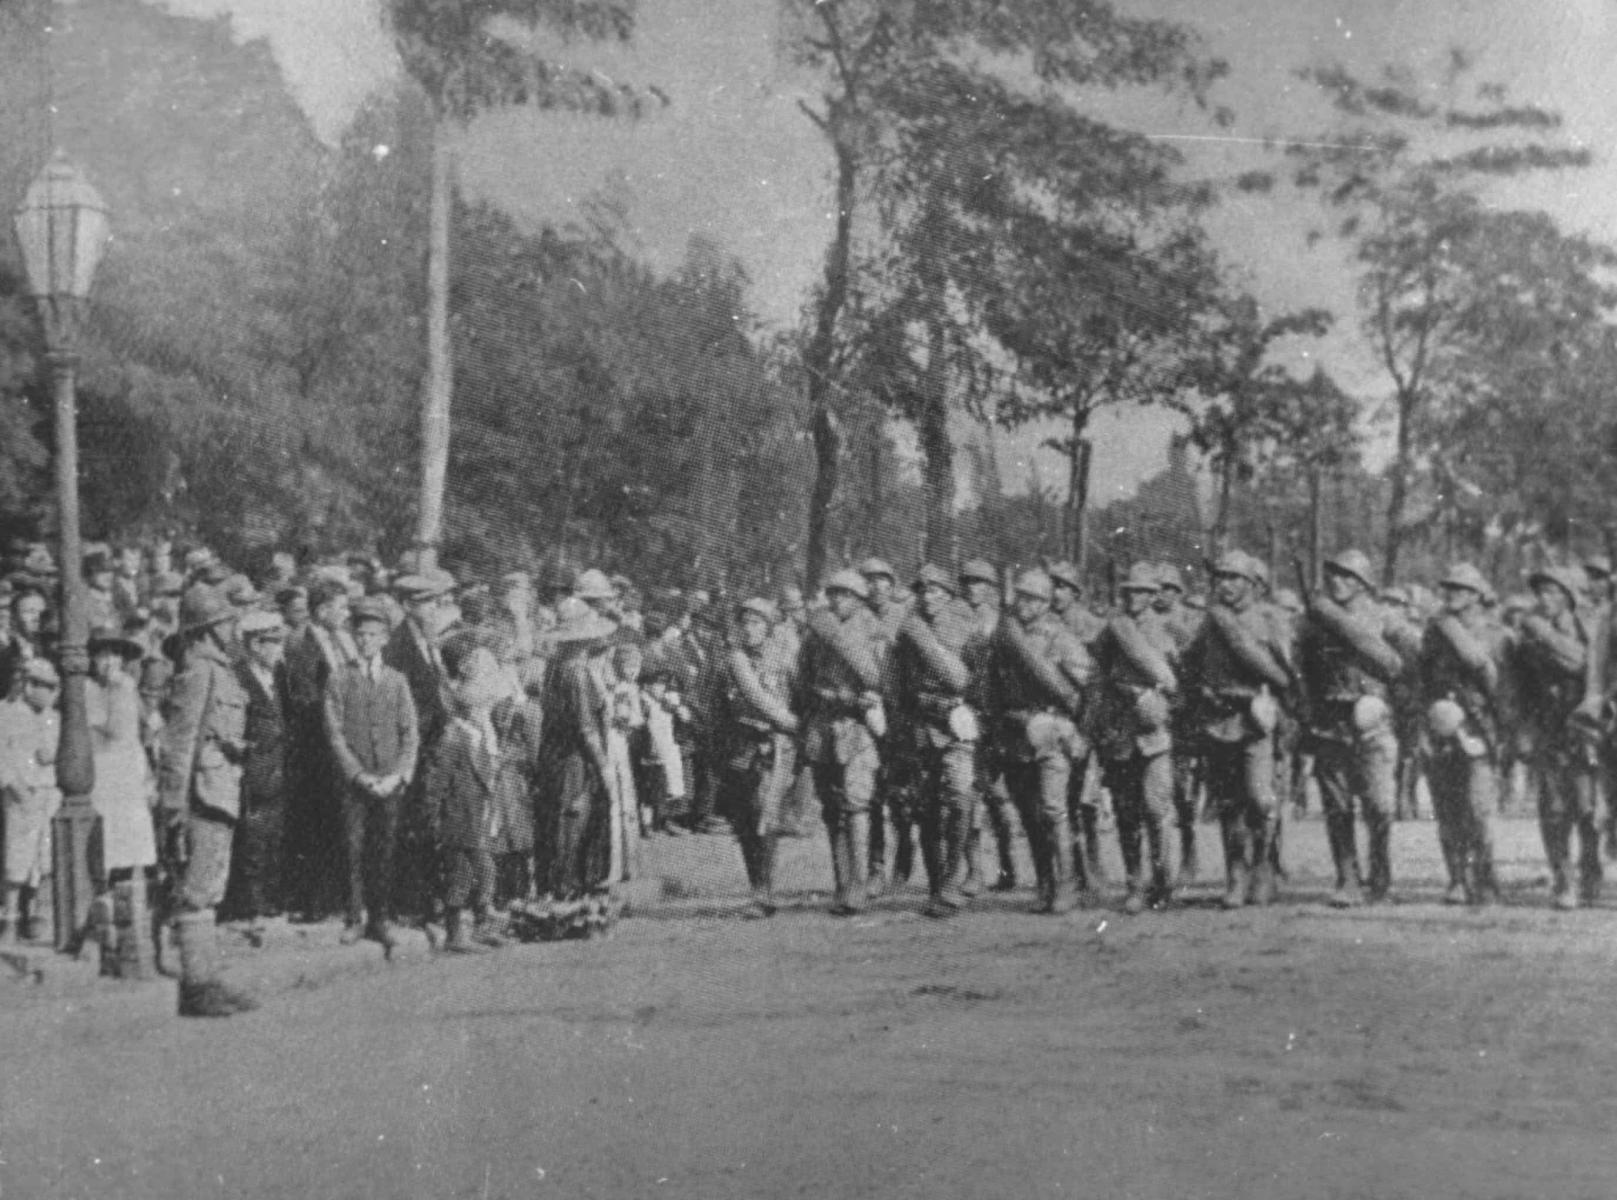 Intrarea trupelor române în Budapesta